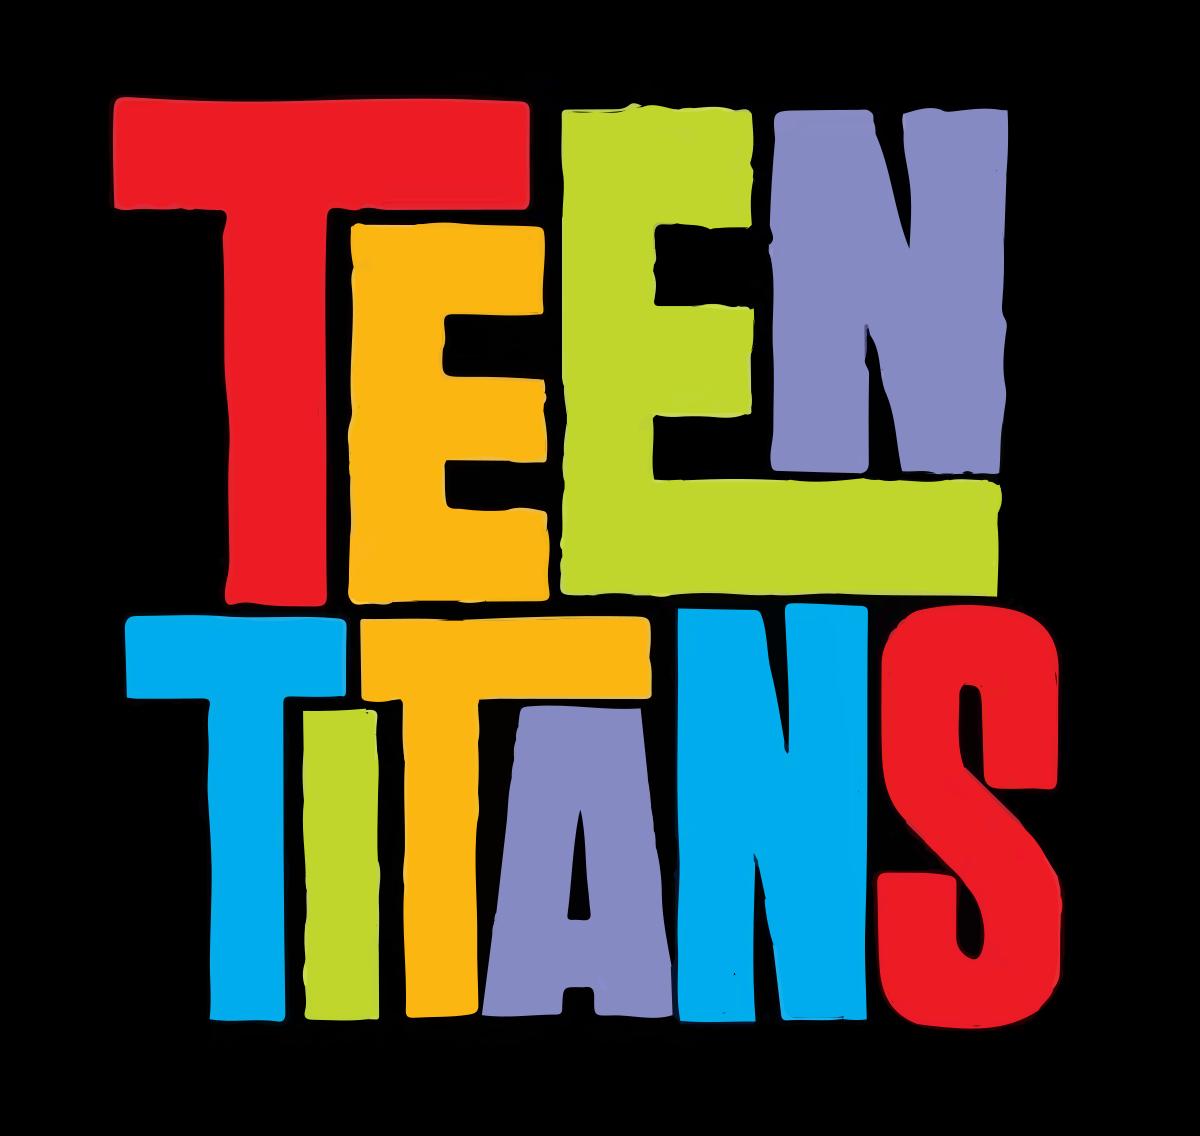 News clipart tv programme. Teen titans series wikipedia